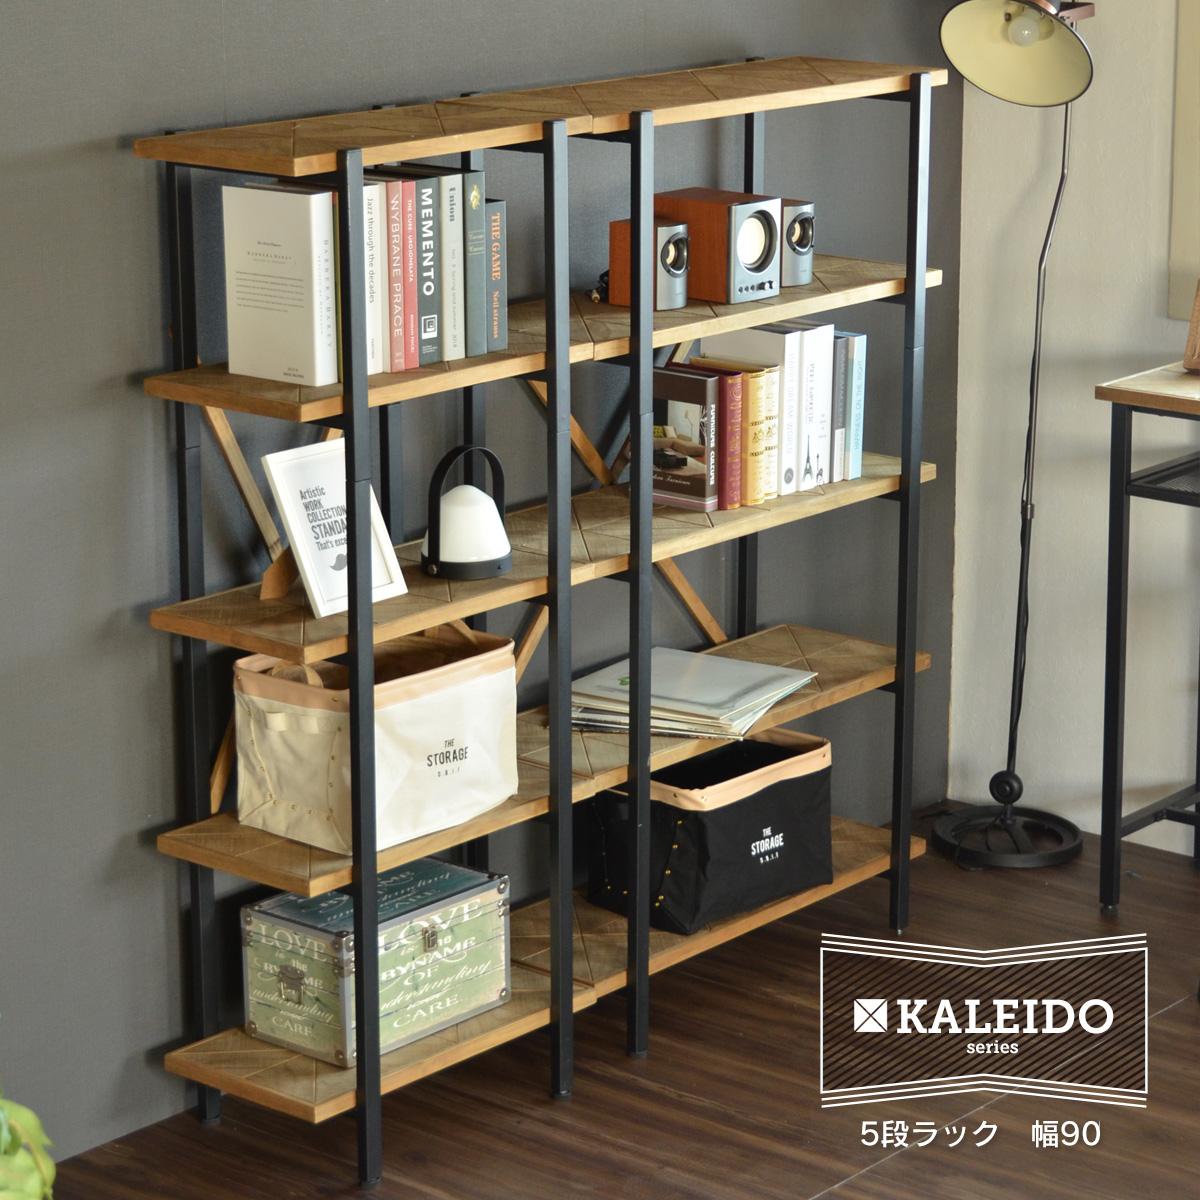 KALEIDO カレイド 5段ラック 幅90 オープン 収納 木製 棚 本棚 シェルフ 間仕切り ディスプレイ コンパクト スリム 省スペース 一人暮らし リビング おしゃれ デザインビンテージ